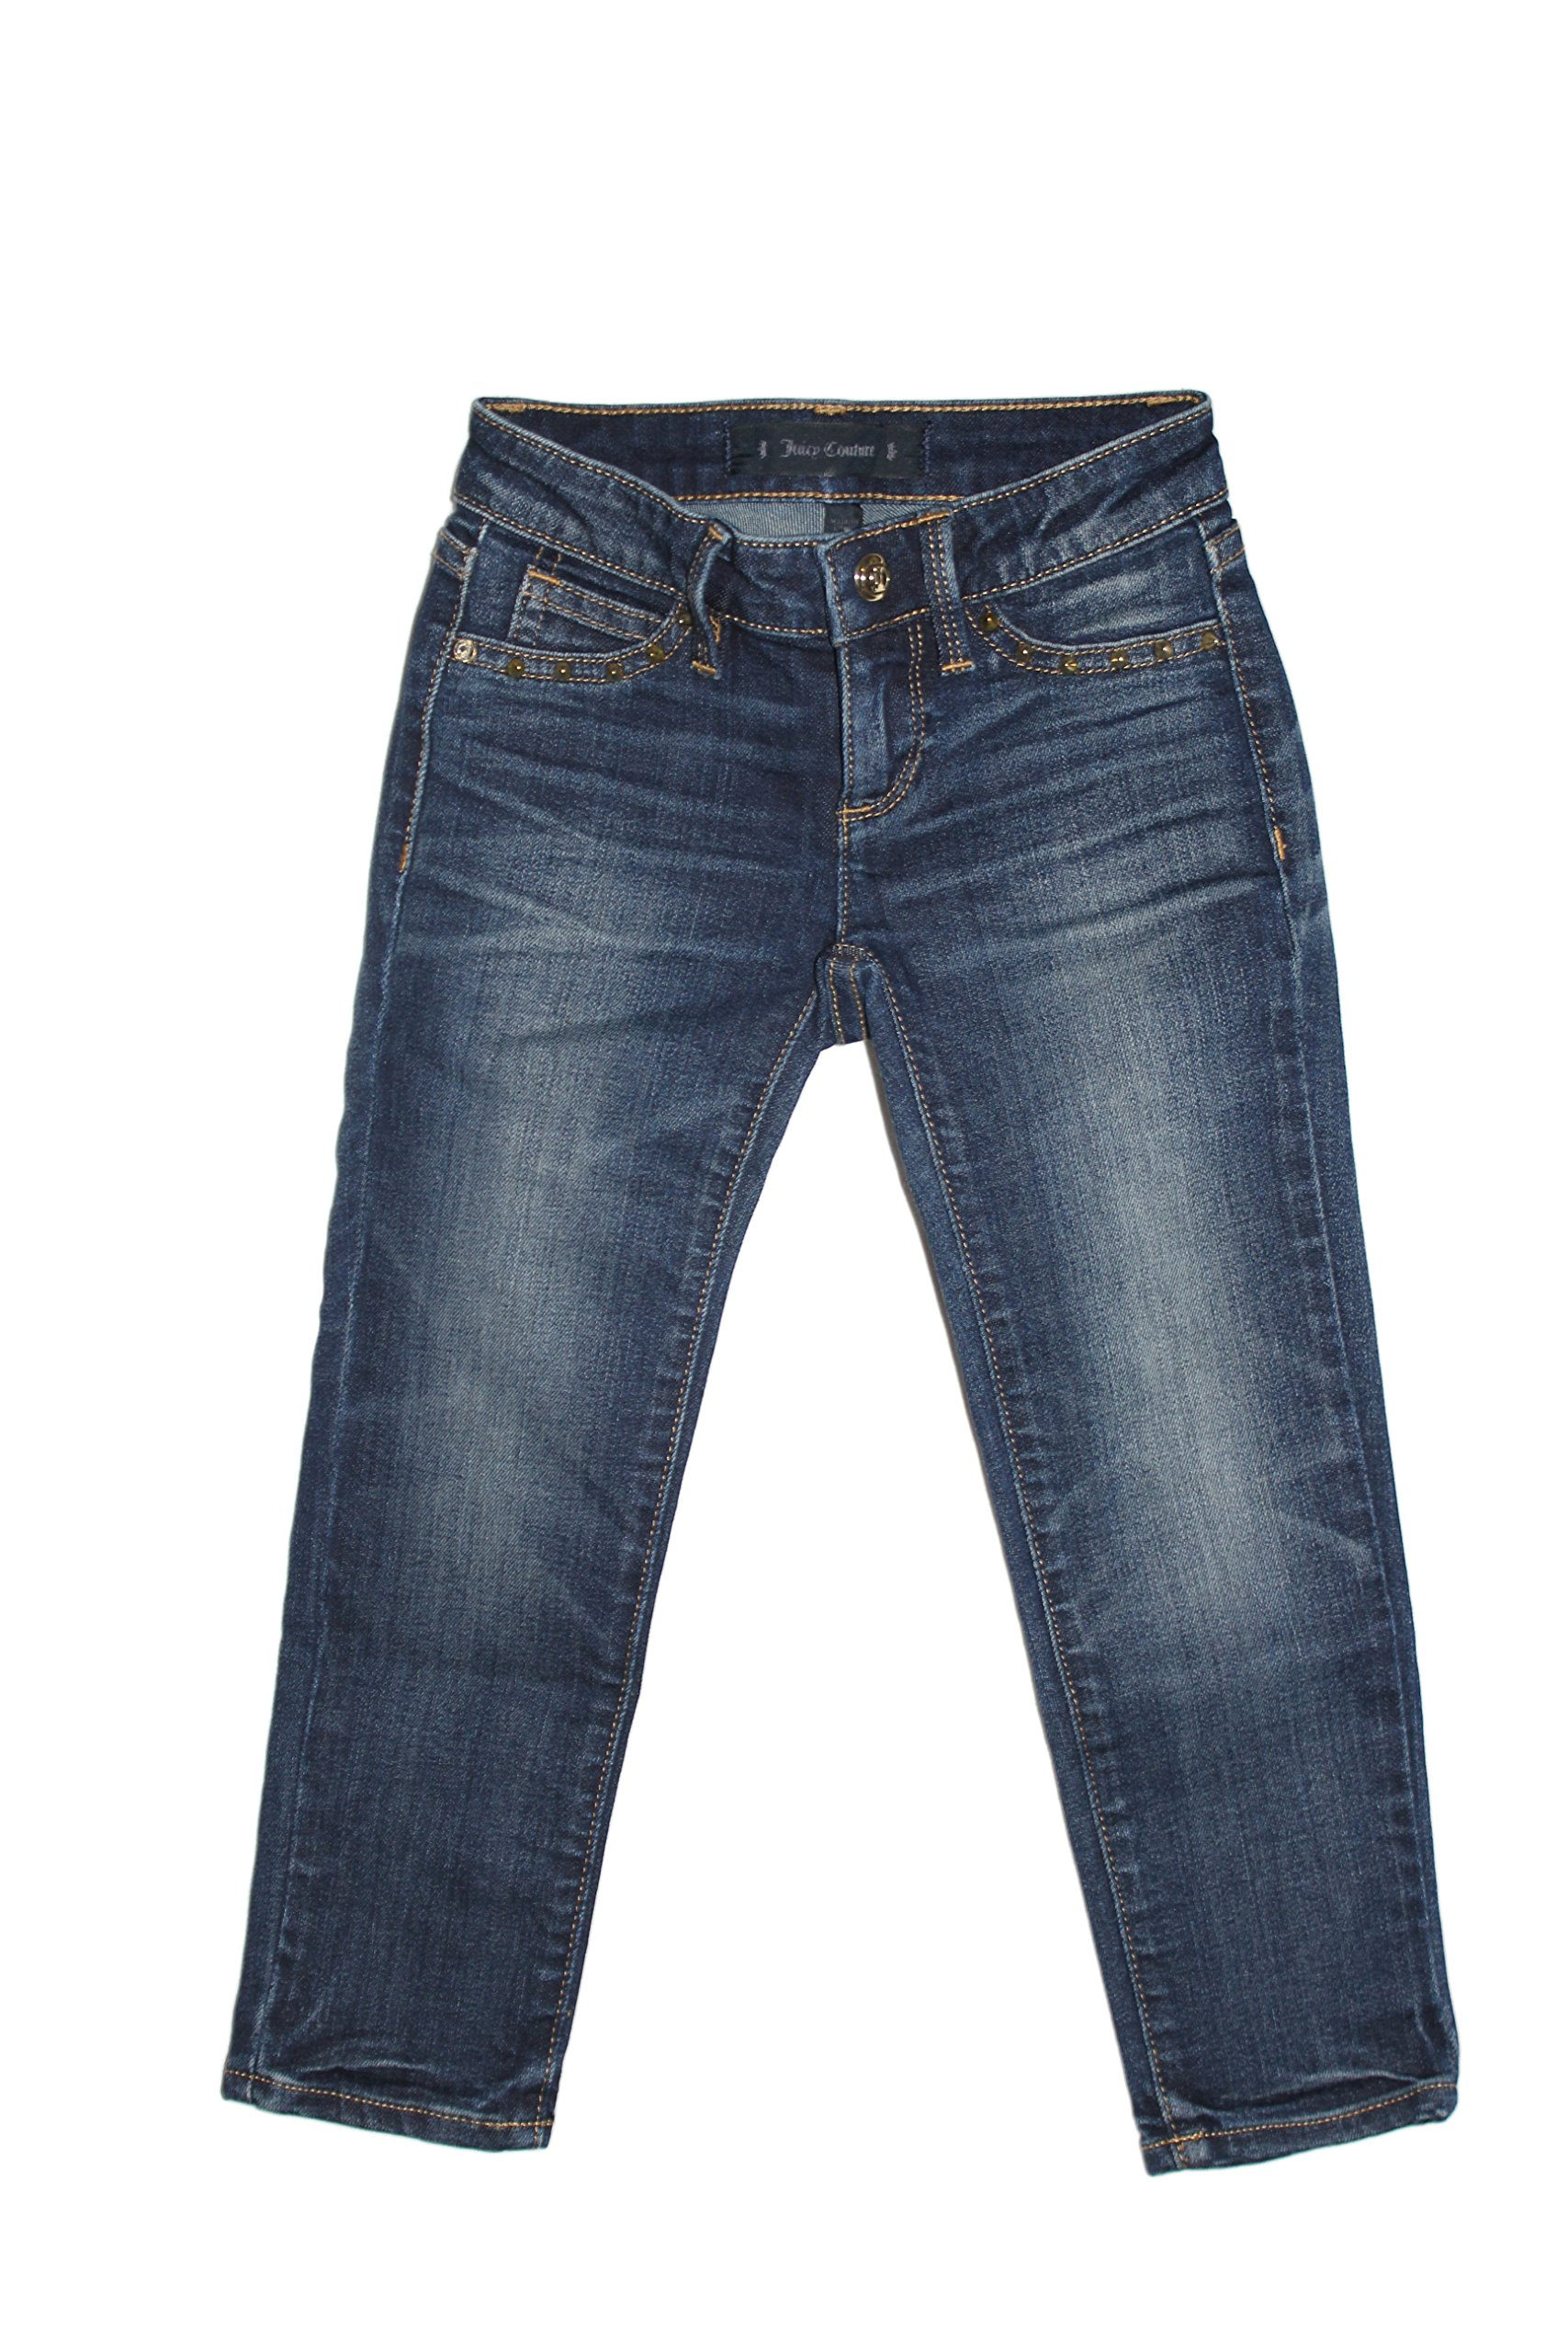 Juicy Couture Girls Skinny Jeans (12, Denim Wash)